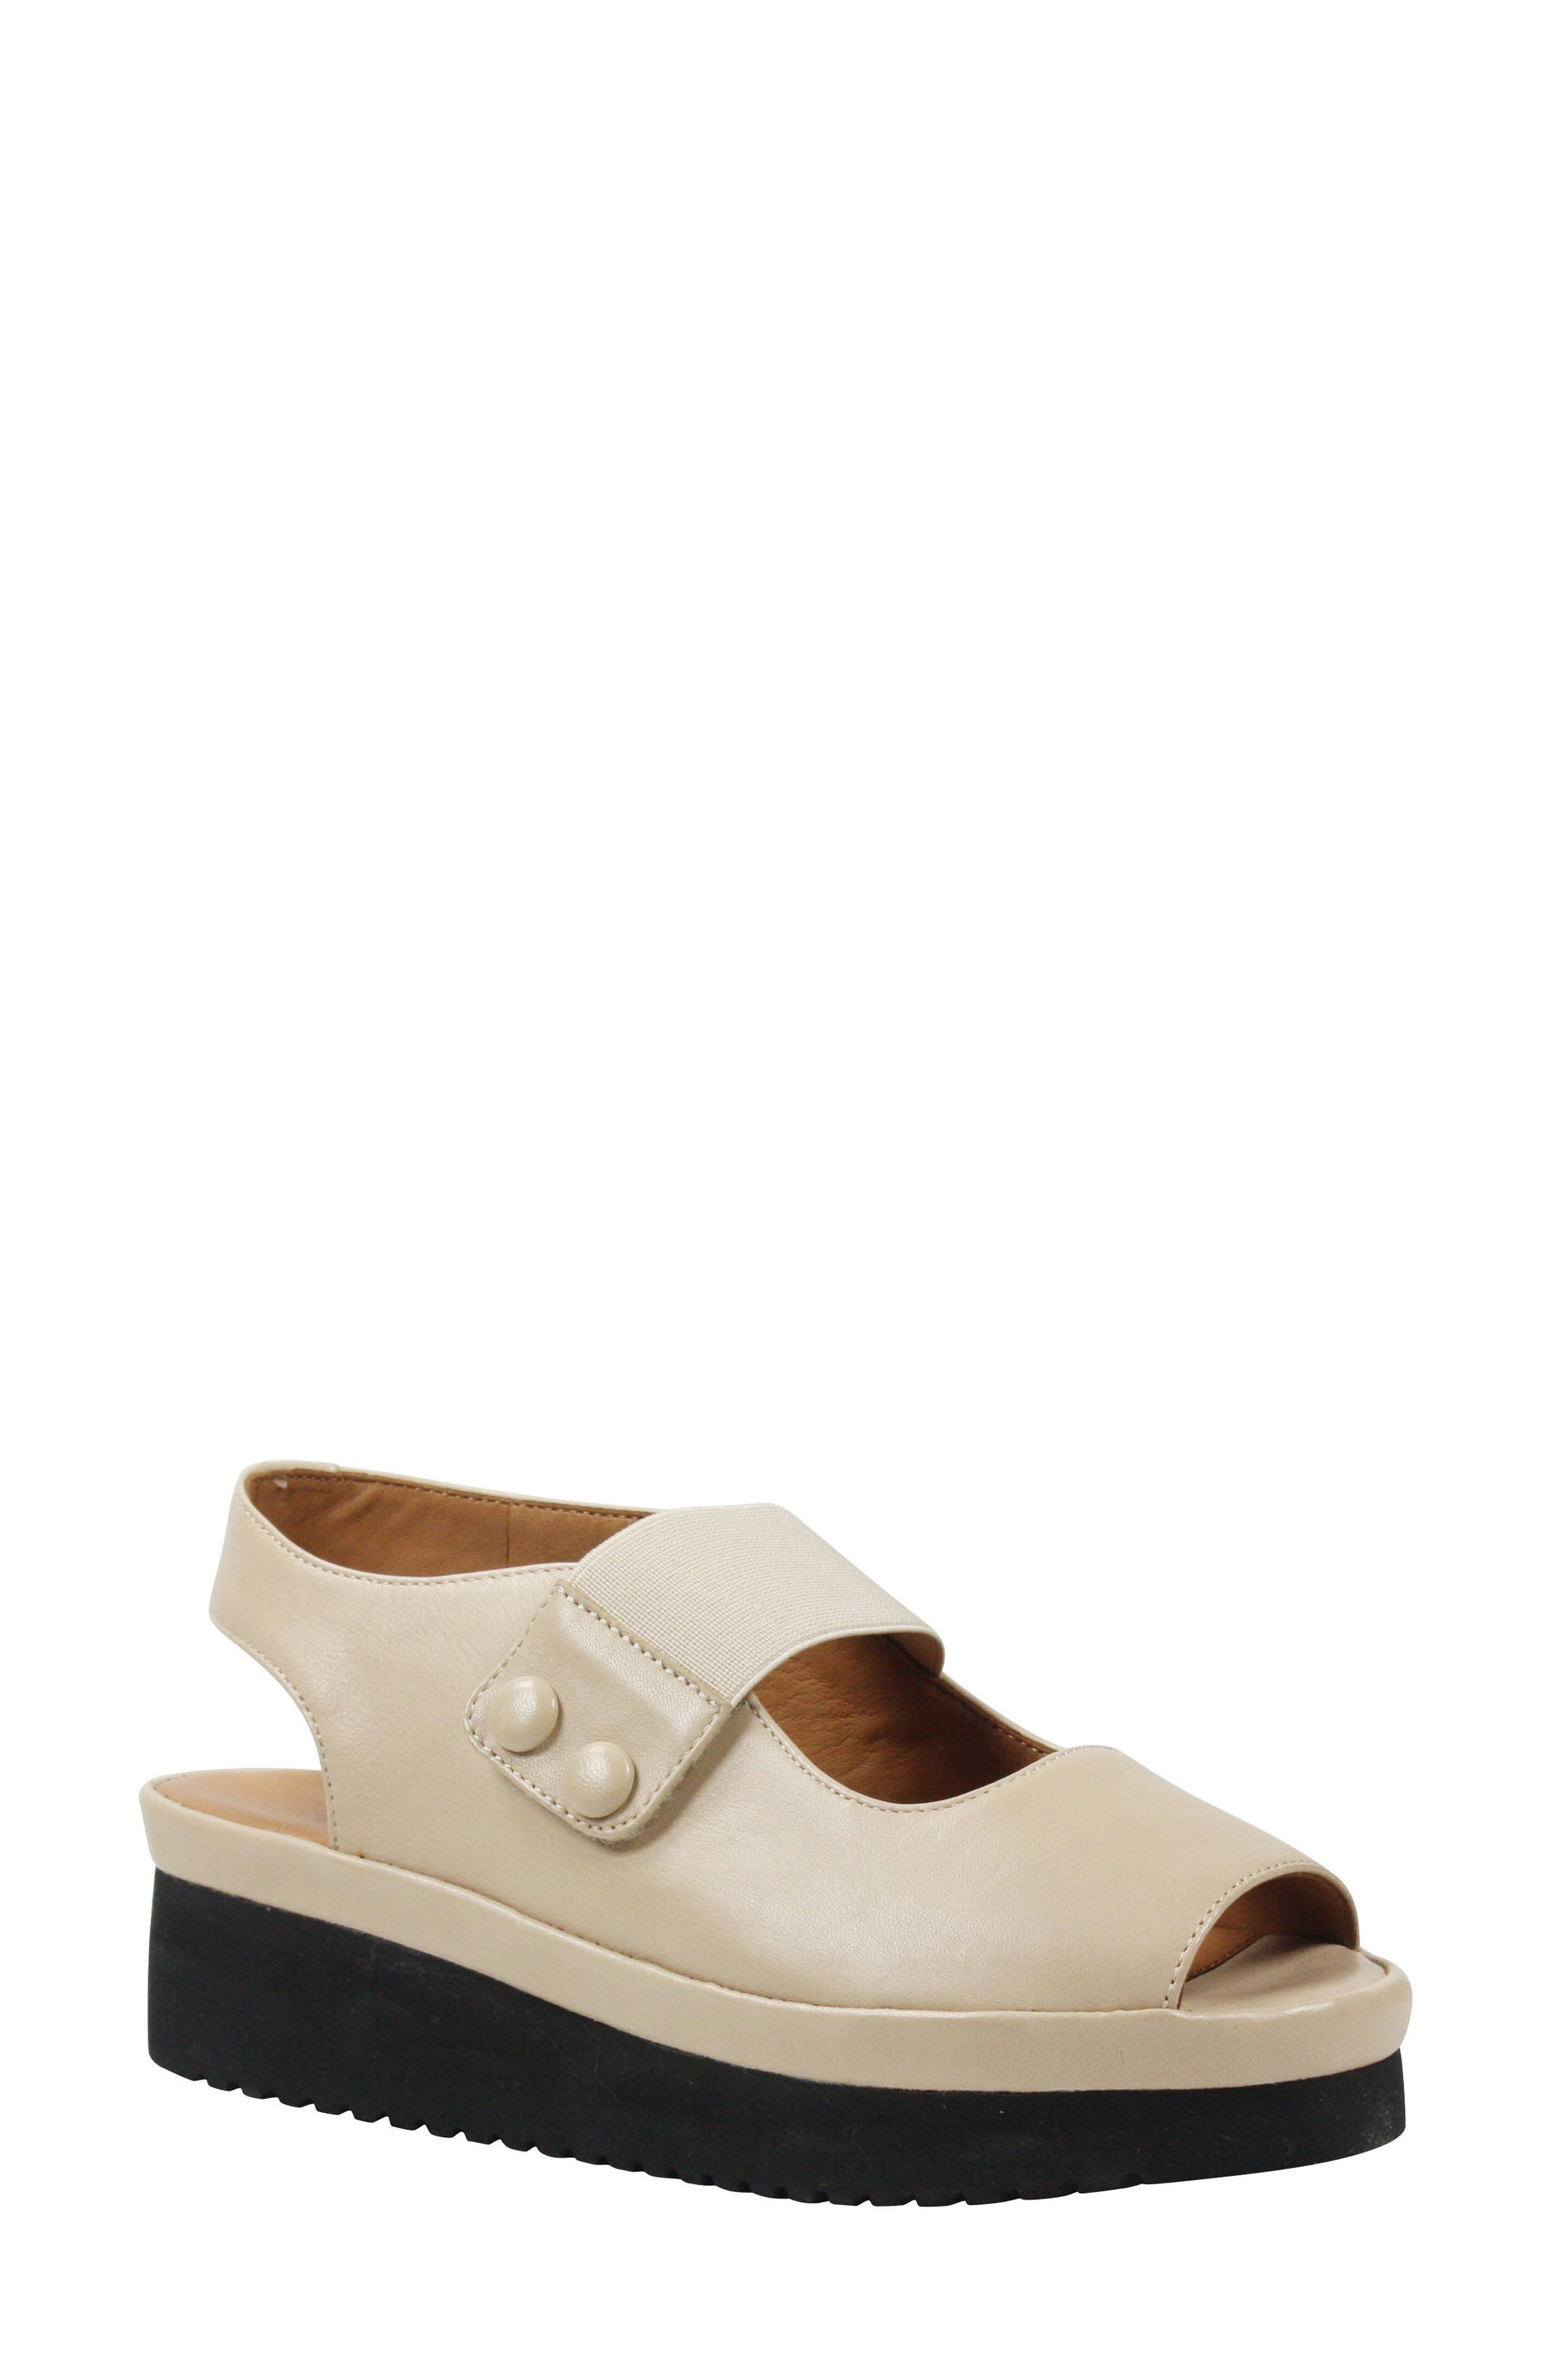 Adalicia Platform Sandal, Main, color, NUDE LEATHER